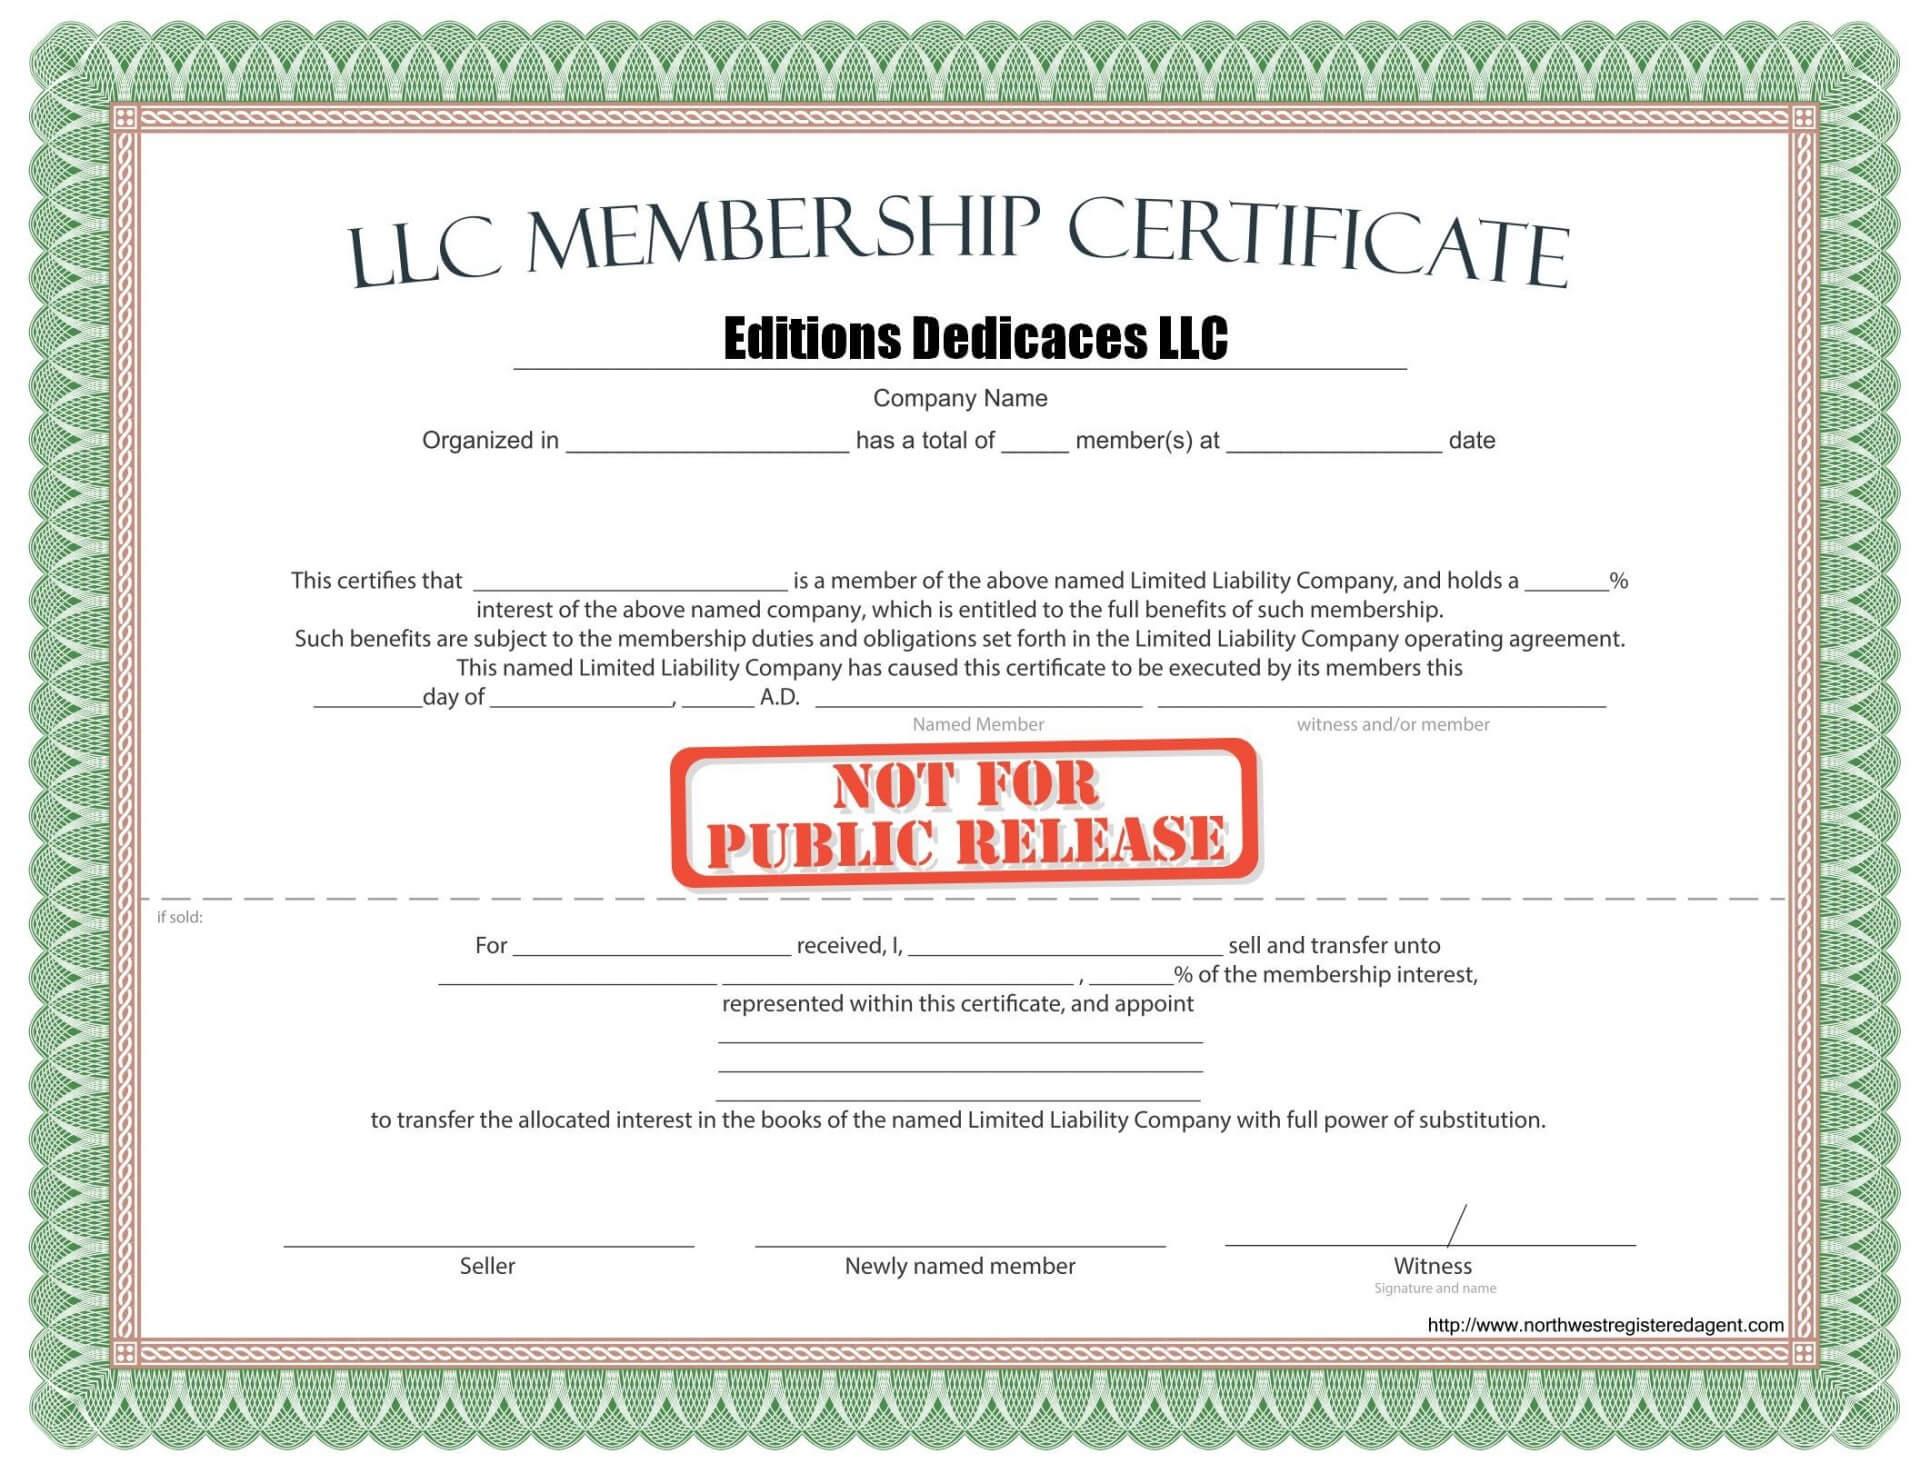 010 Llc Membership Certificate Template Best Solutions For Inside New Member Certificate Template